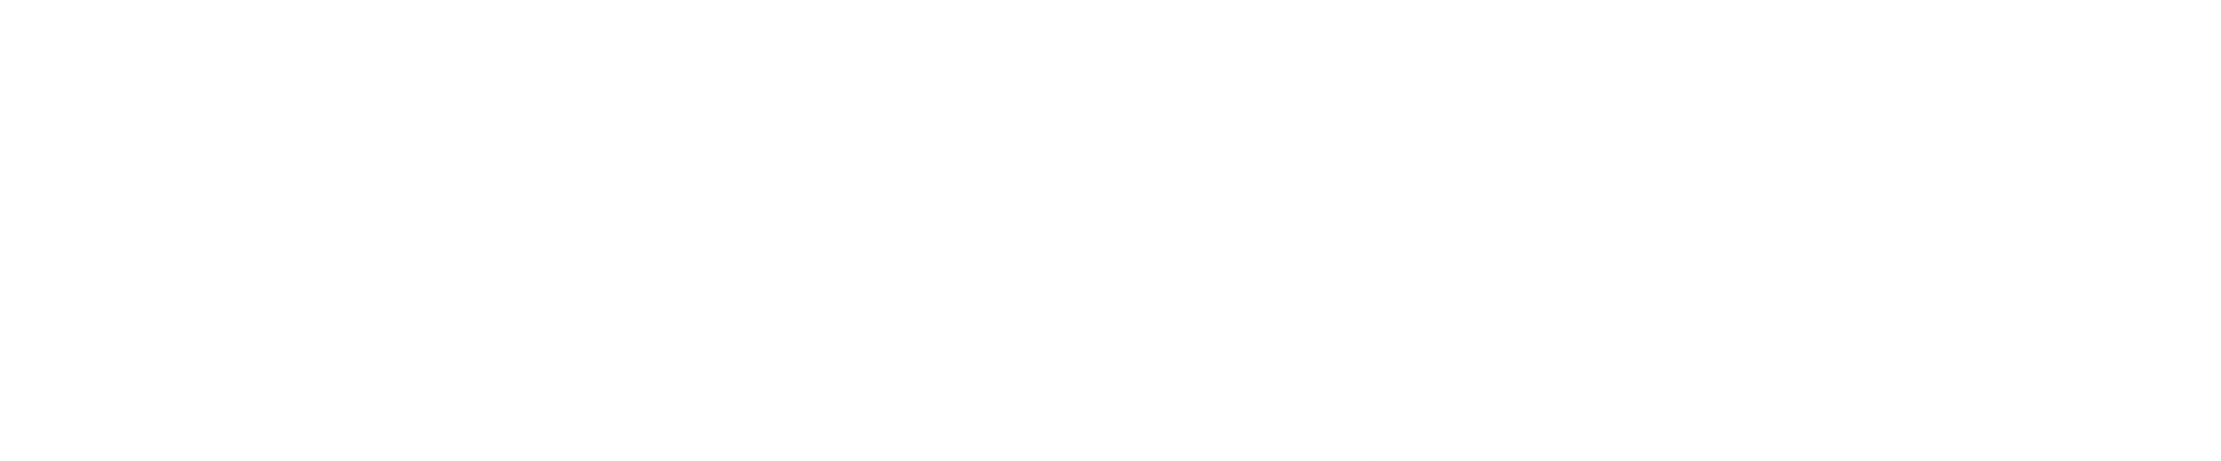 Logo for Santa Barbara Beach & Golf Resort